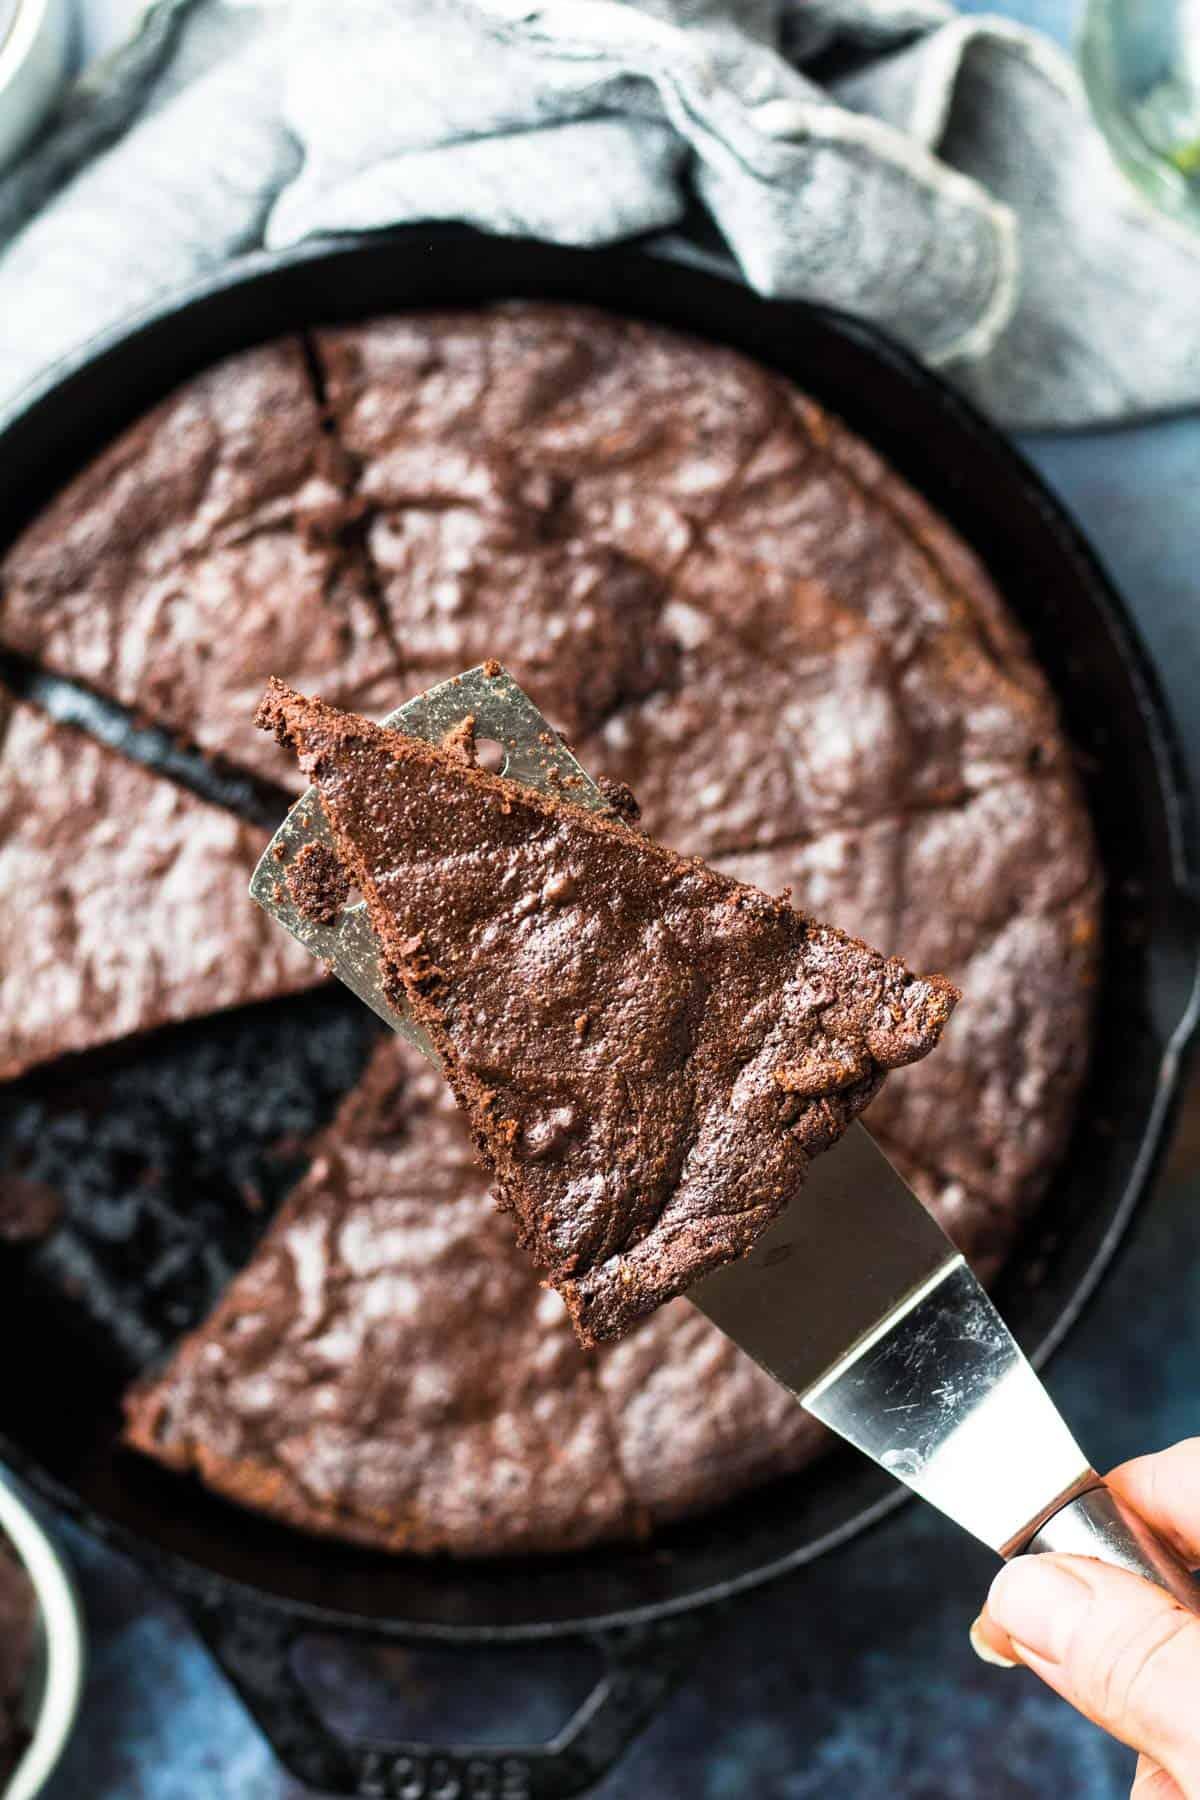 Keto Mocha Chocolate Cake in a cast iron skillet